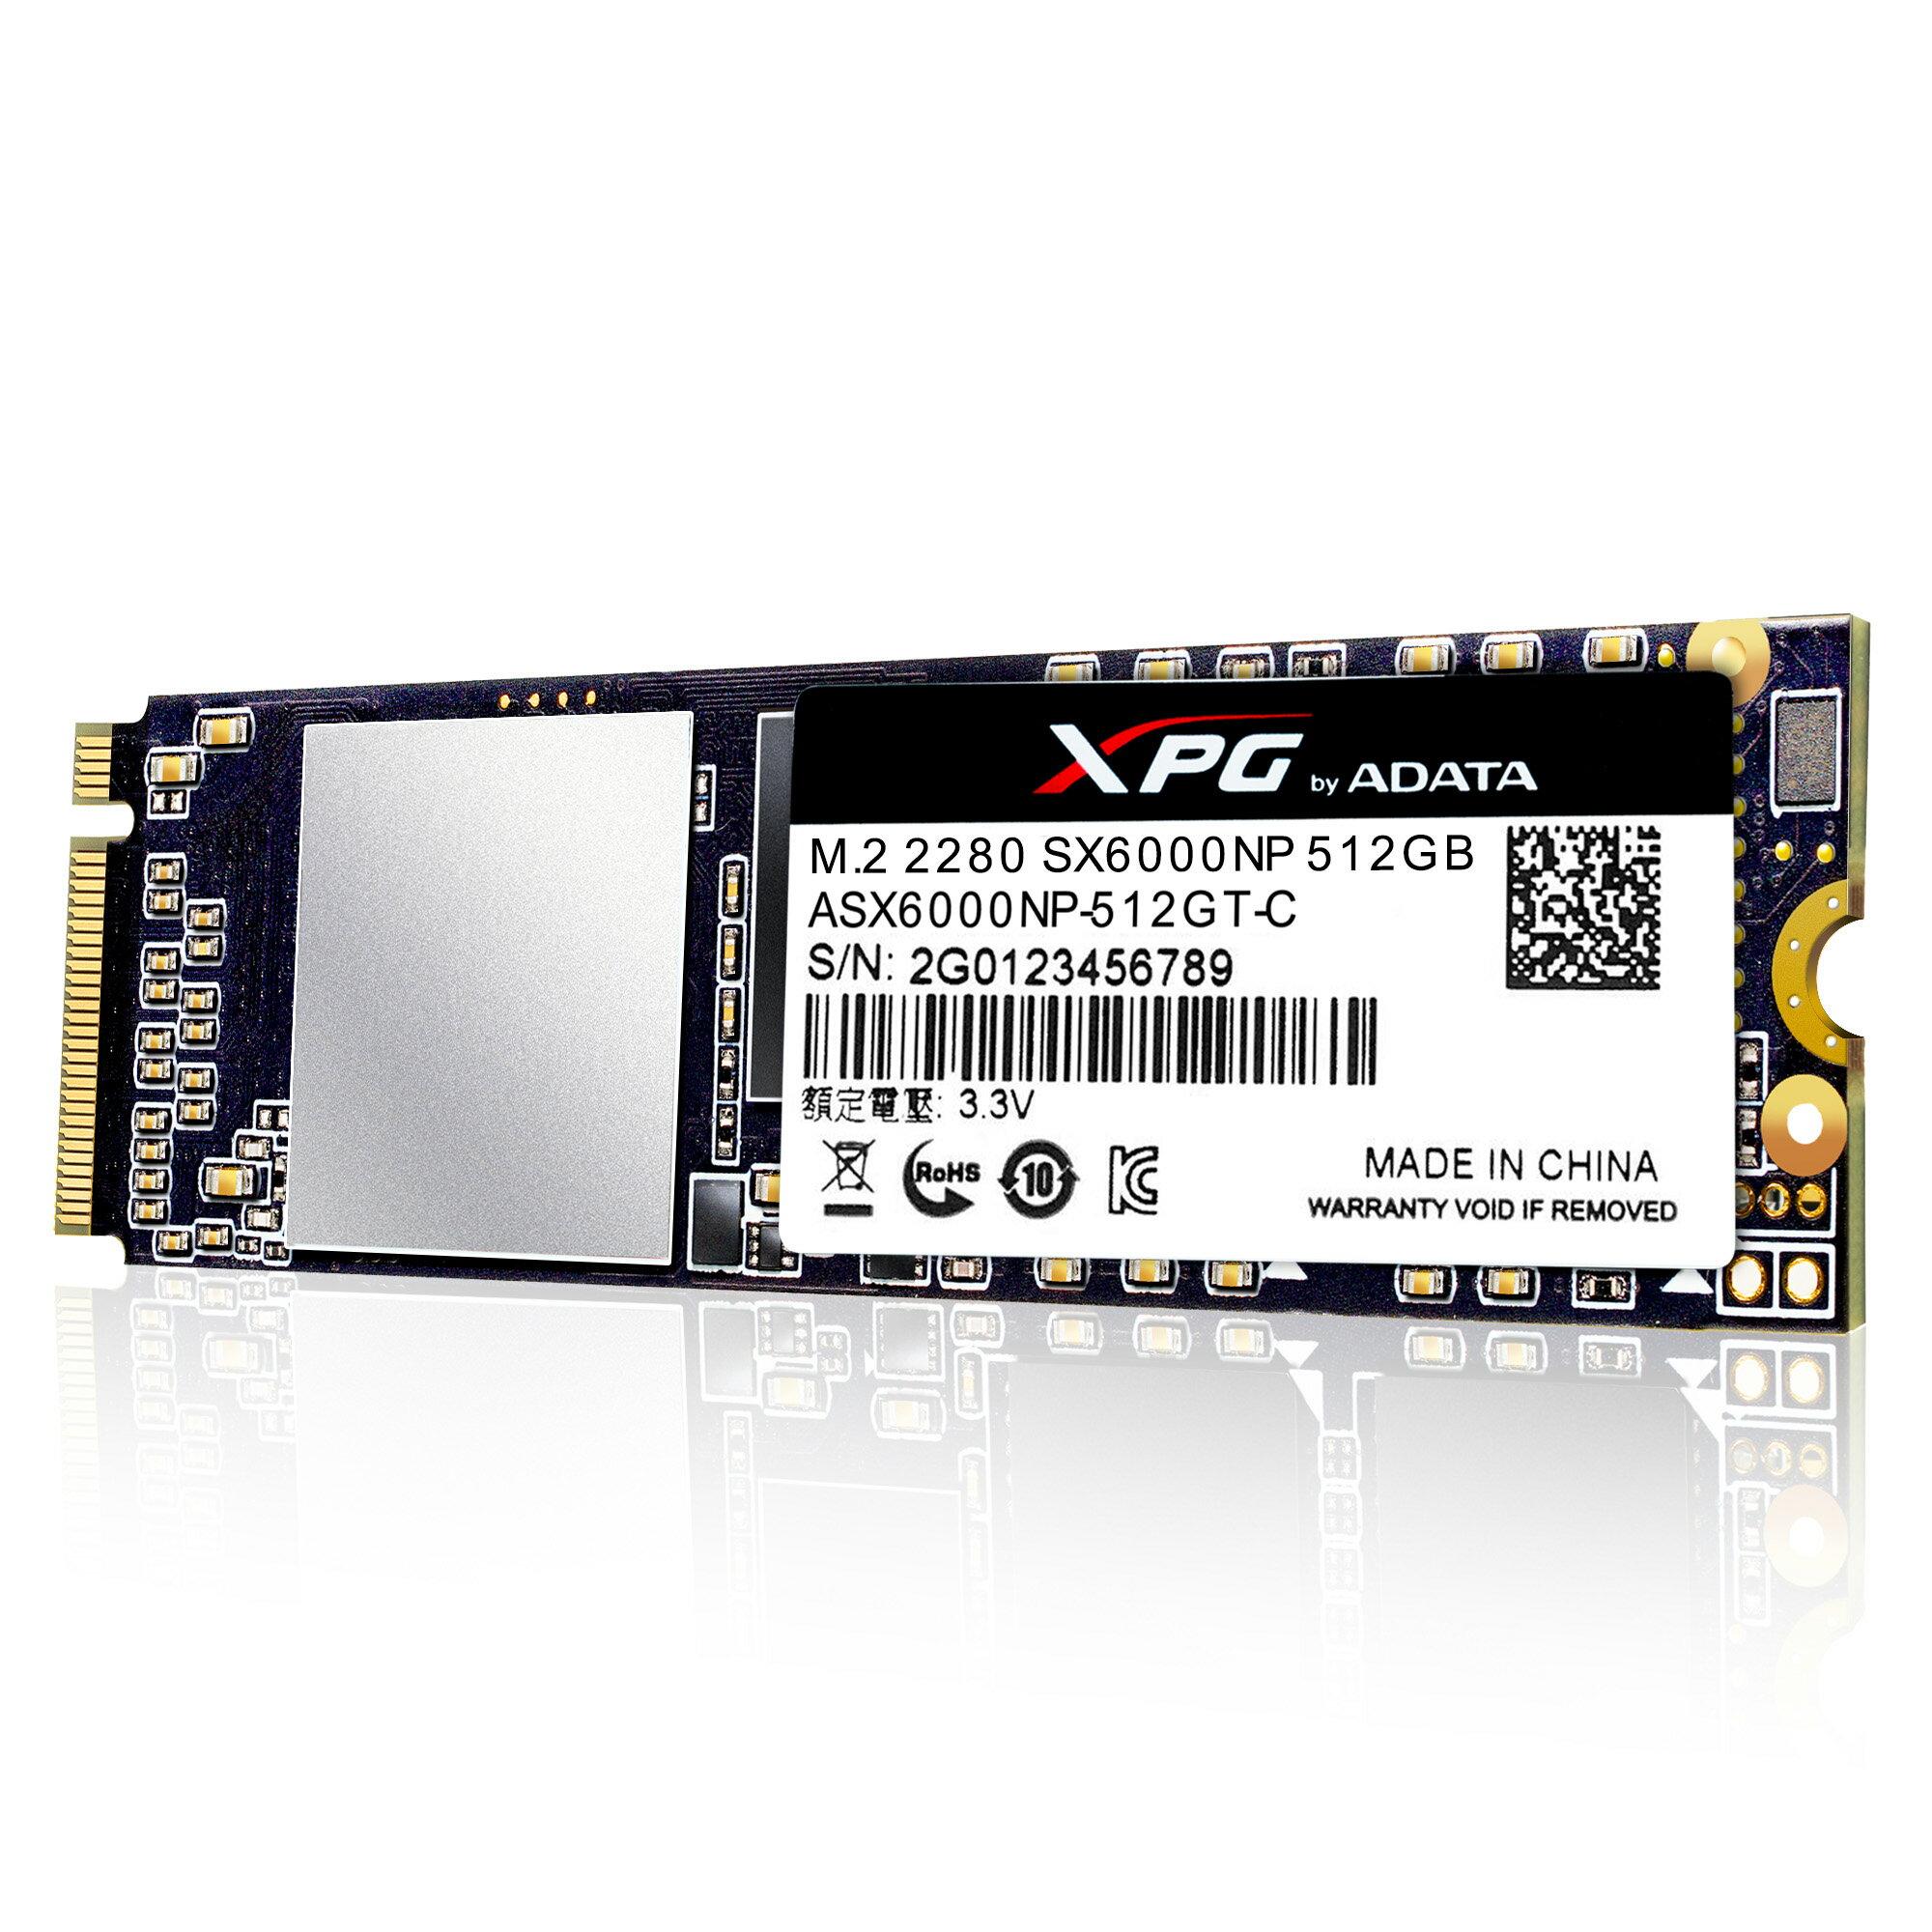 XPG SX6000 PCIe NVMe Gen3x2 M.2 2280 512GB SSD by ADATA with DIY XPG Heatsink 6